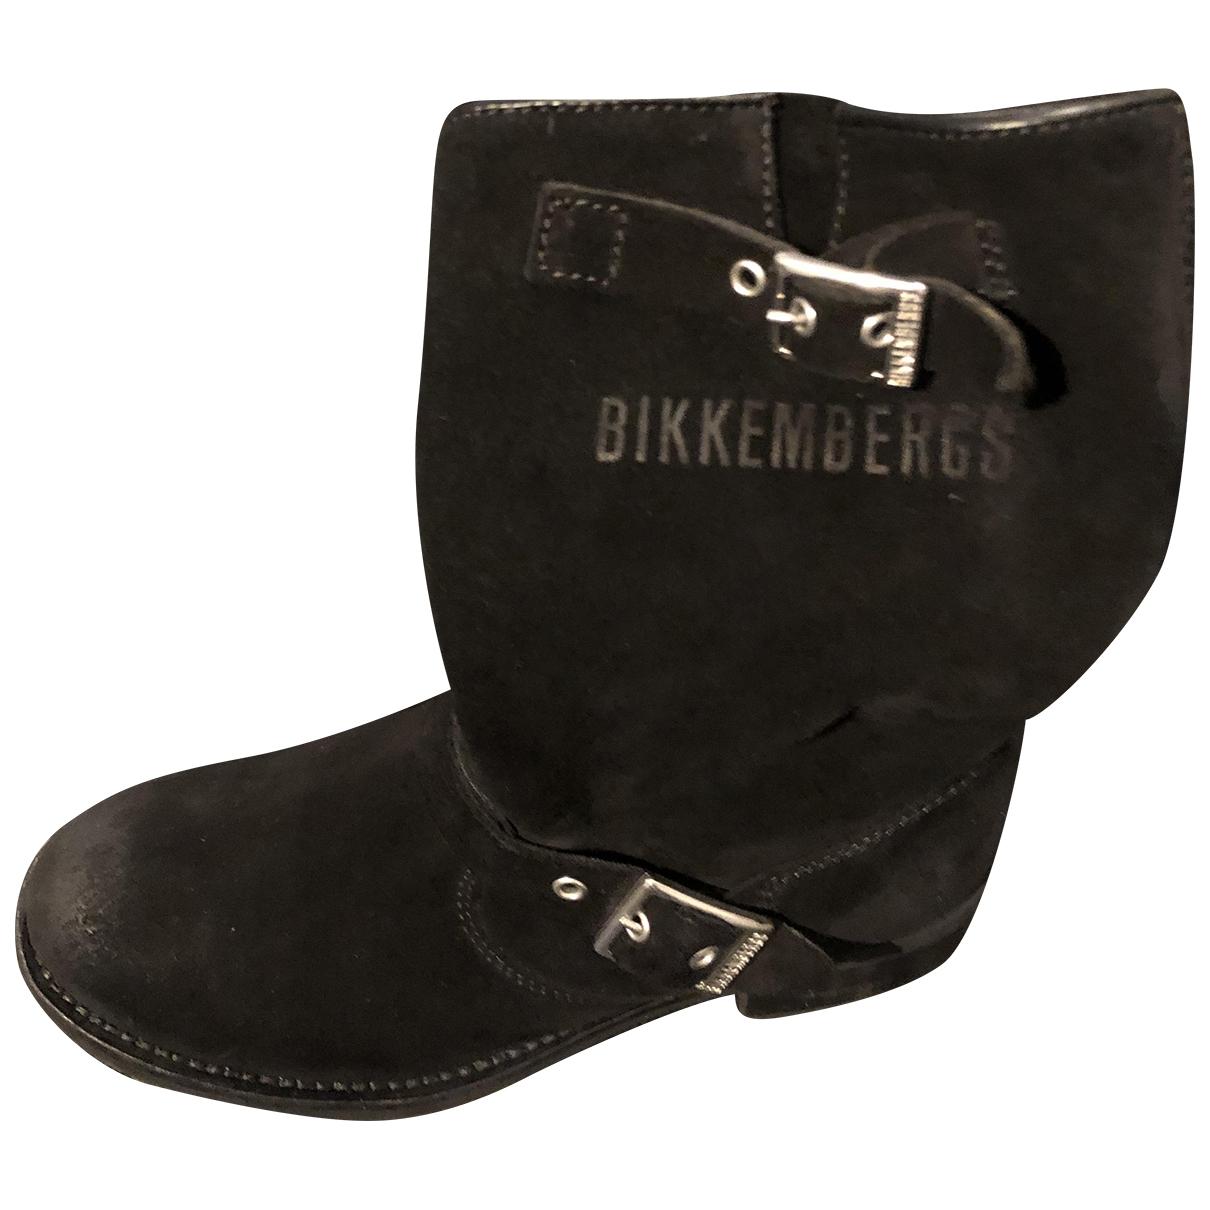 Dirk Bikkembergs - Boots   pour femme en suede - noir